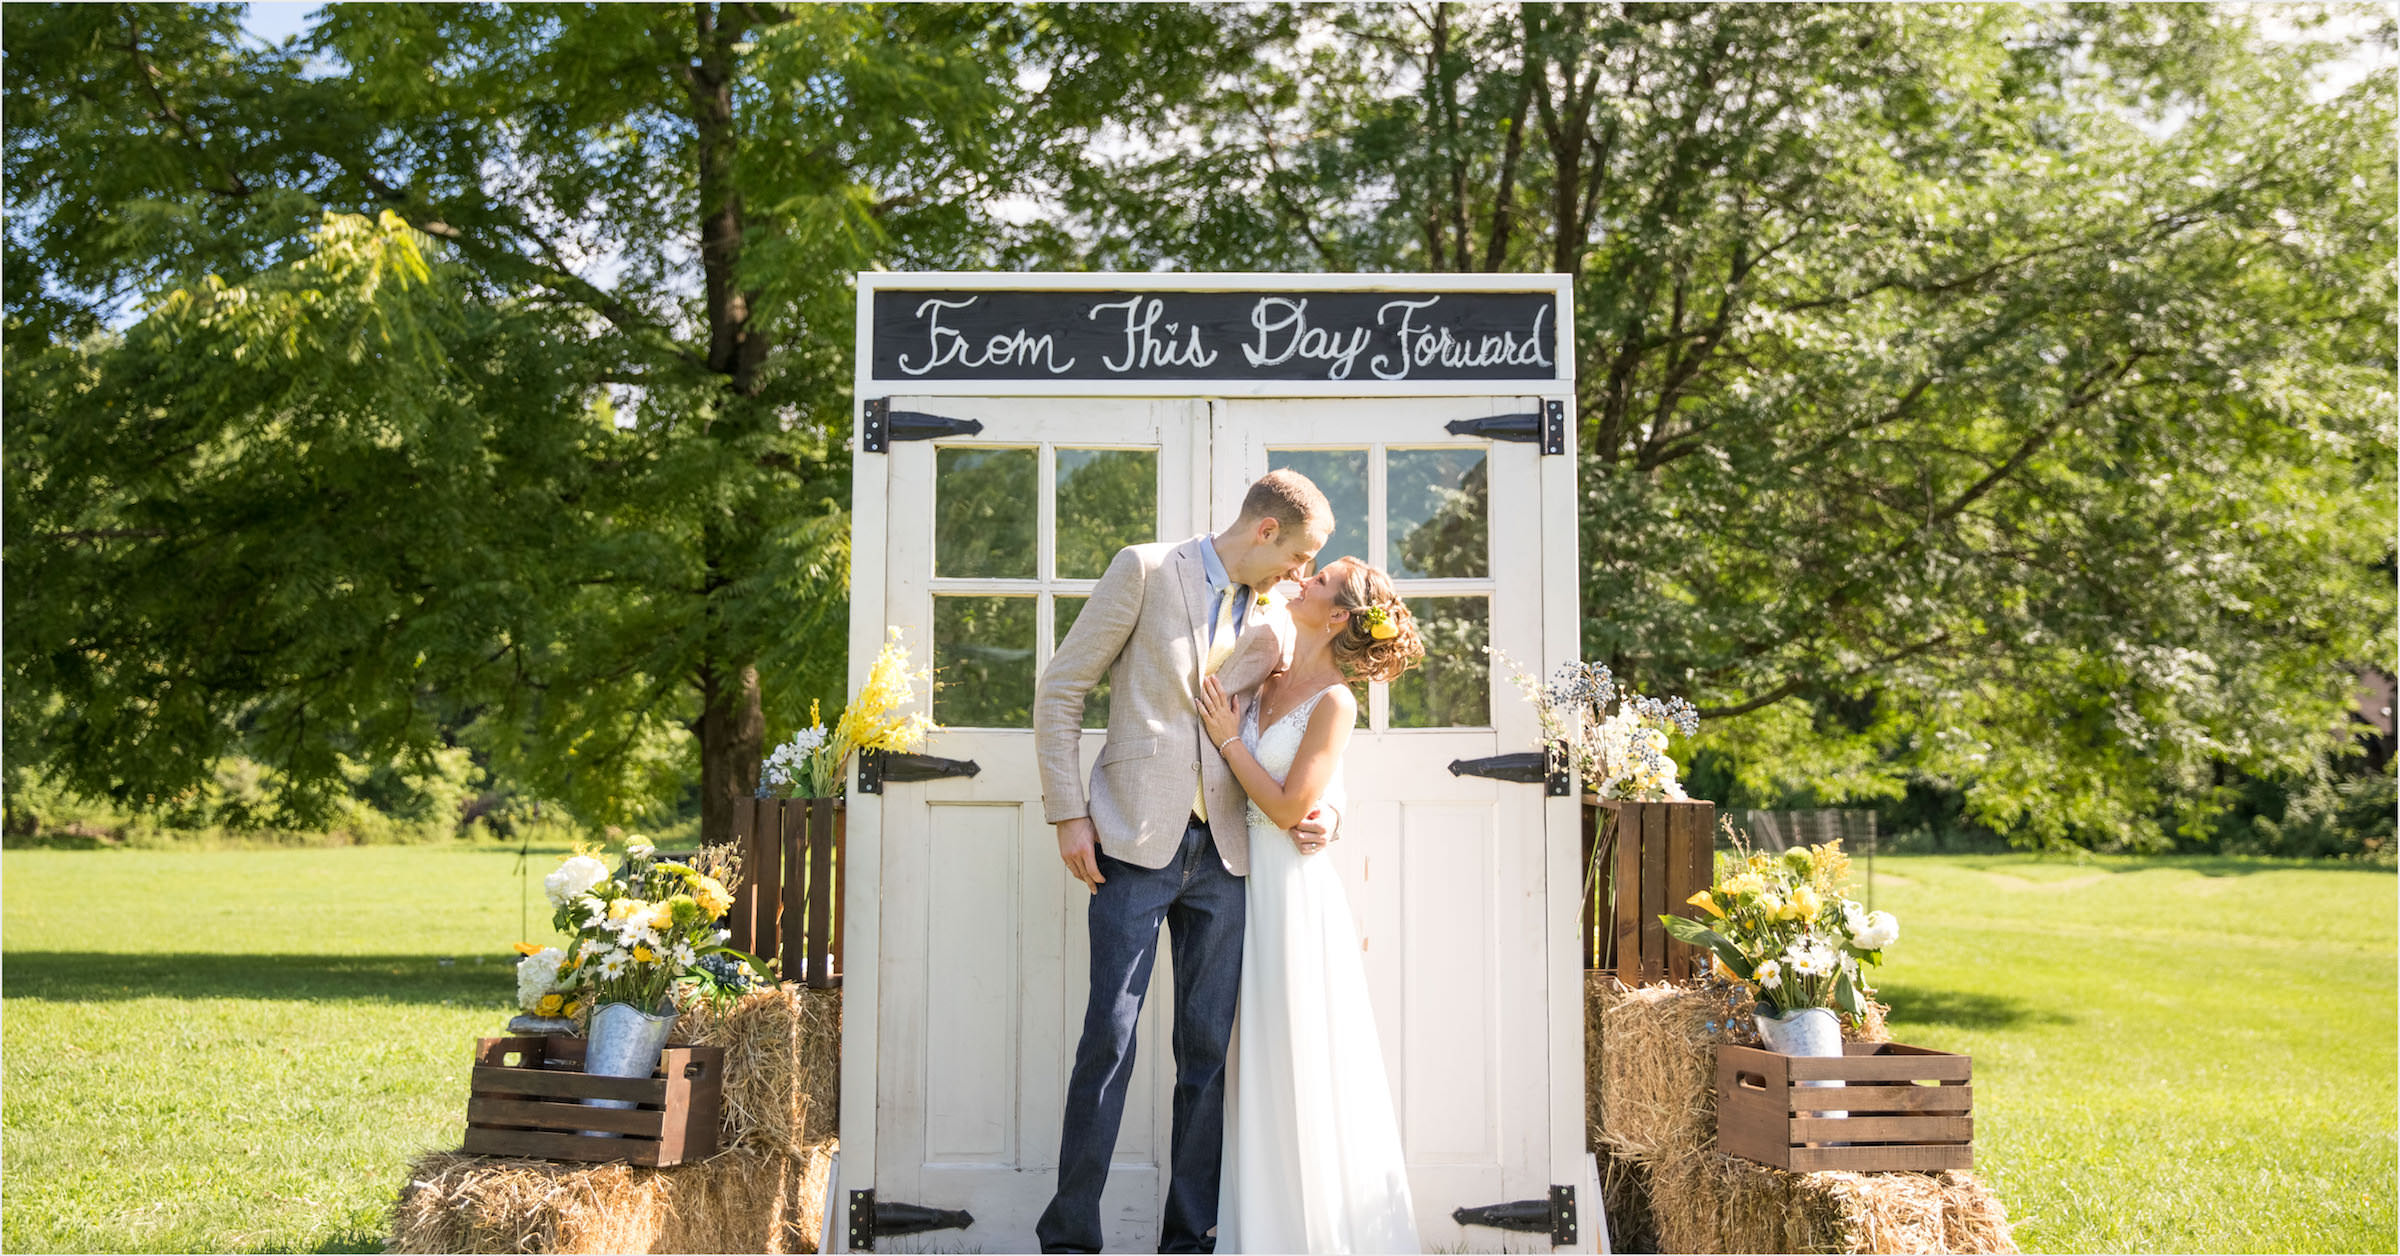 Cassondre Mae Photography Warwick NY Wedding Photographer -16.jpg